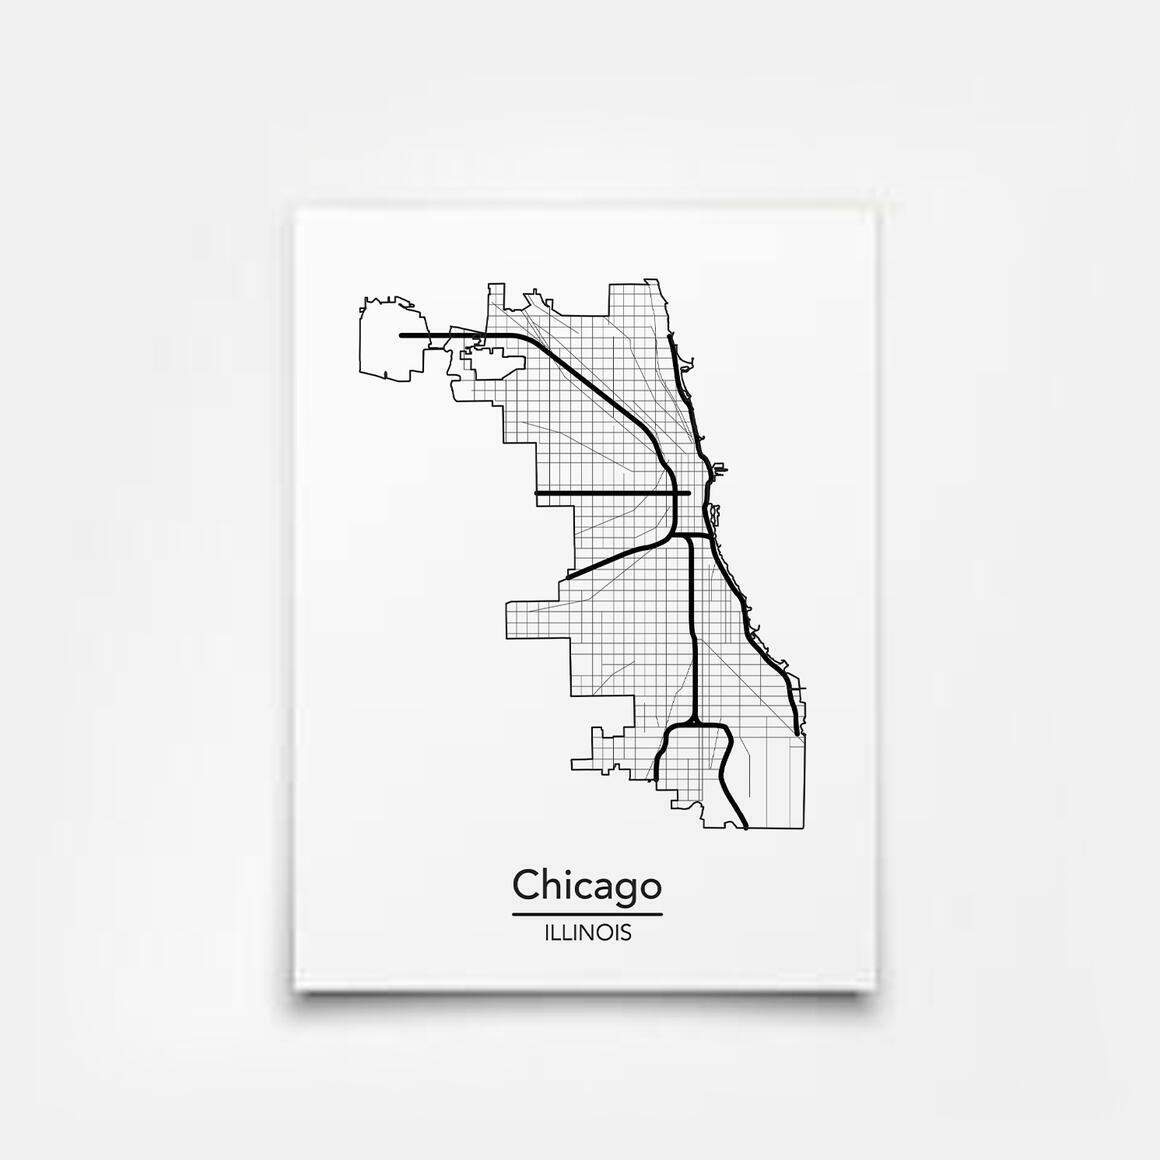 Chicago, Illinois City Map Print   Trada Marketplace